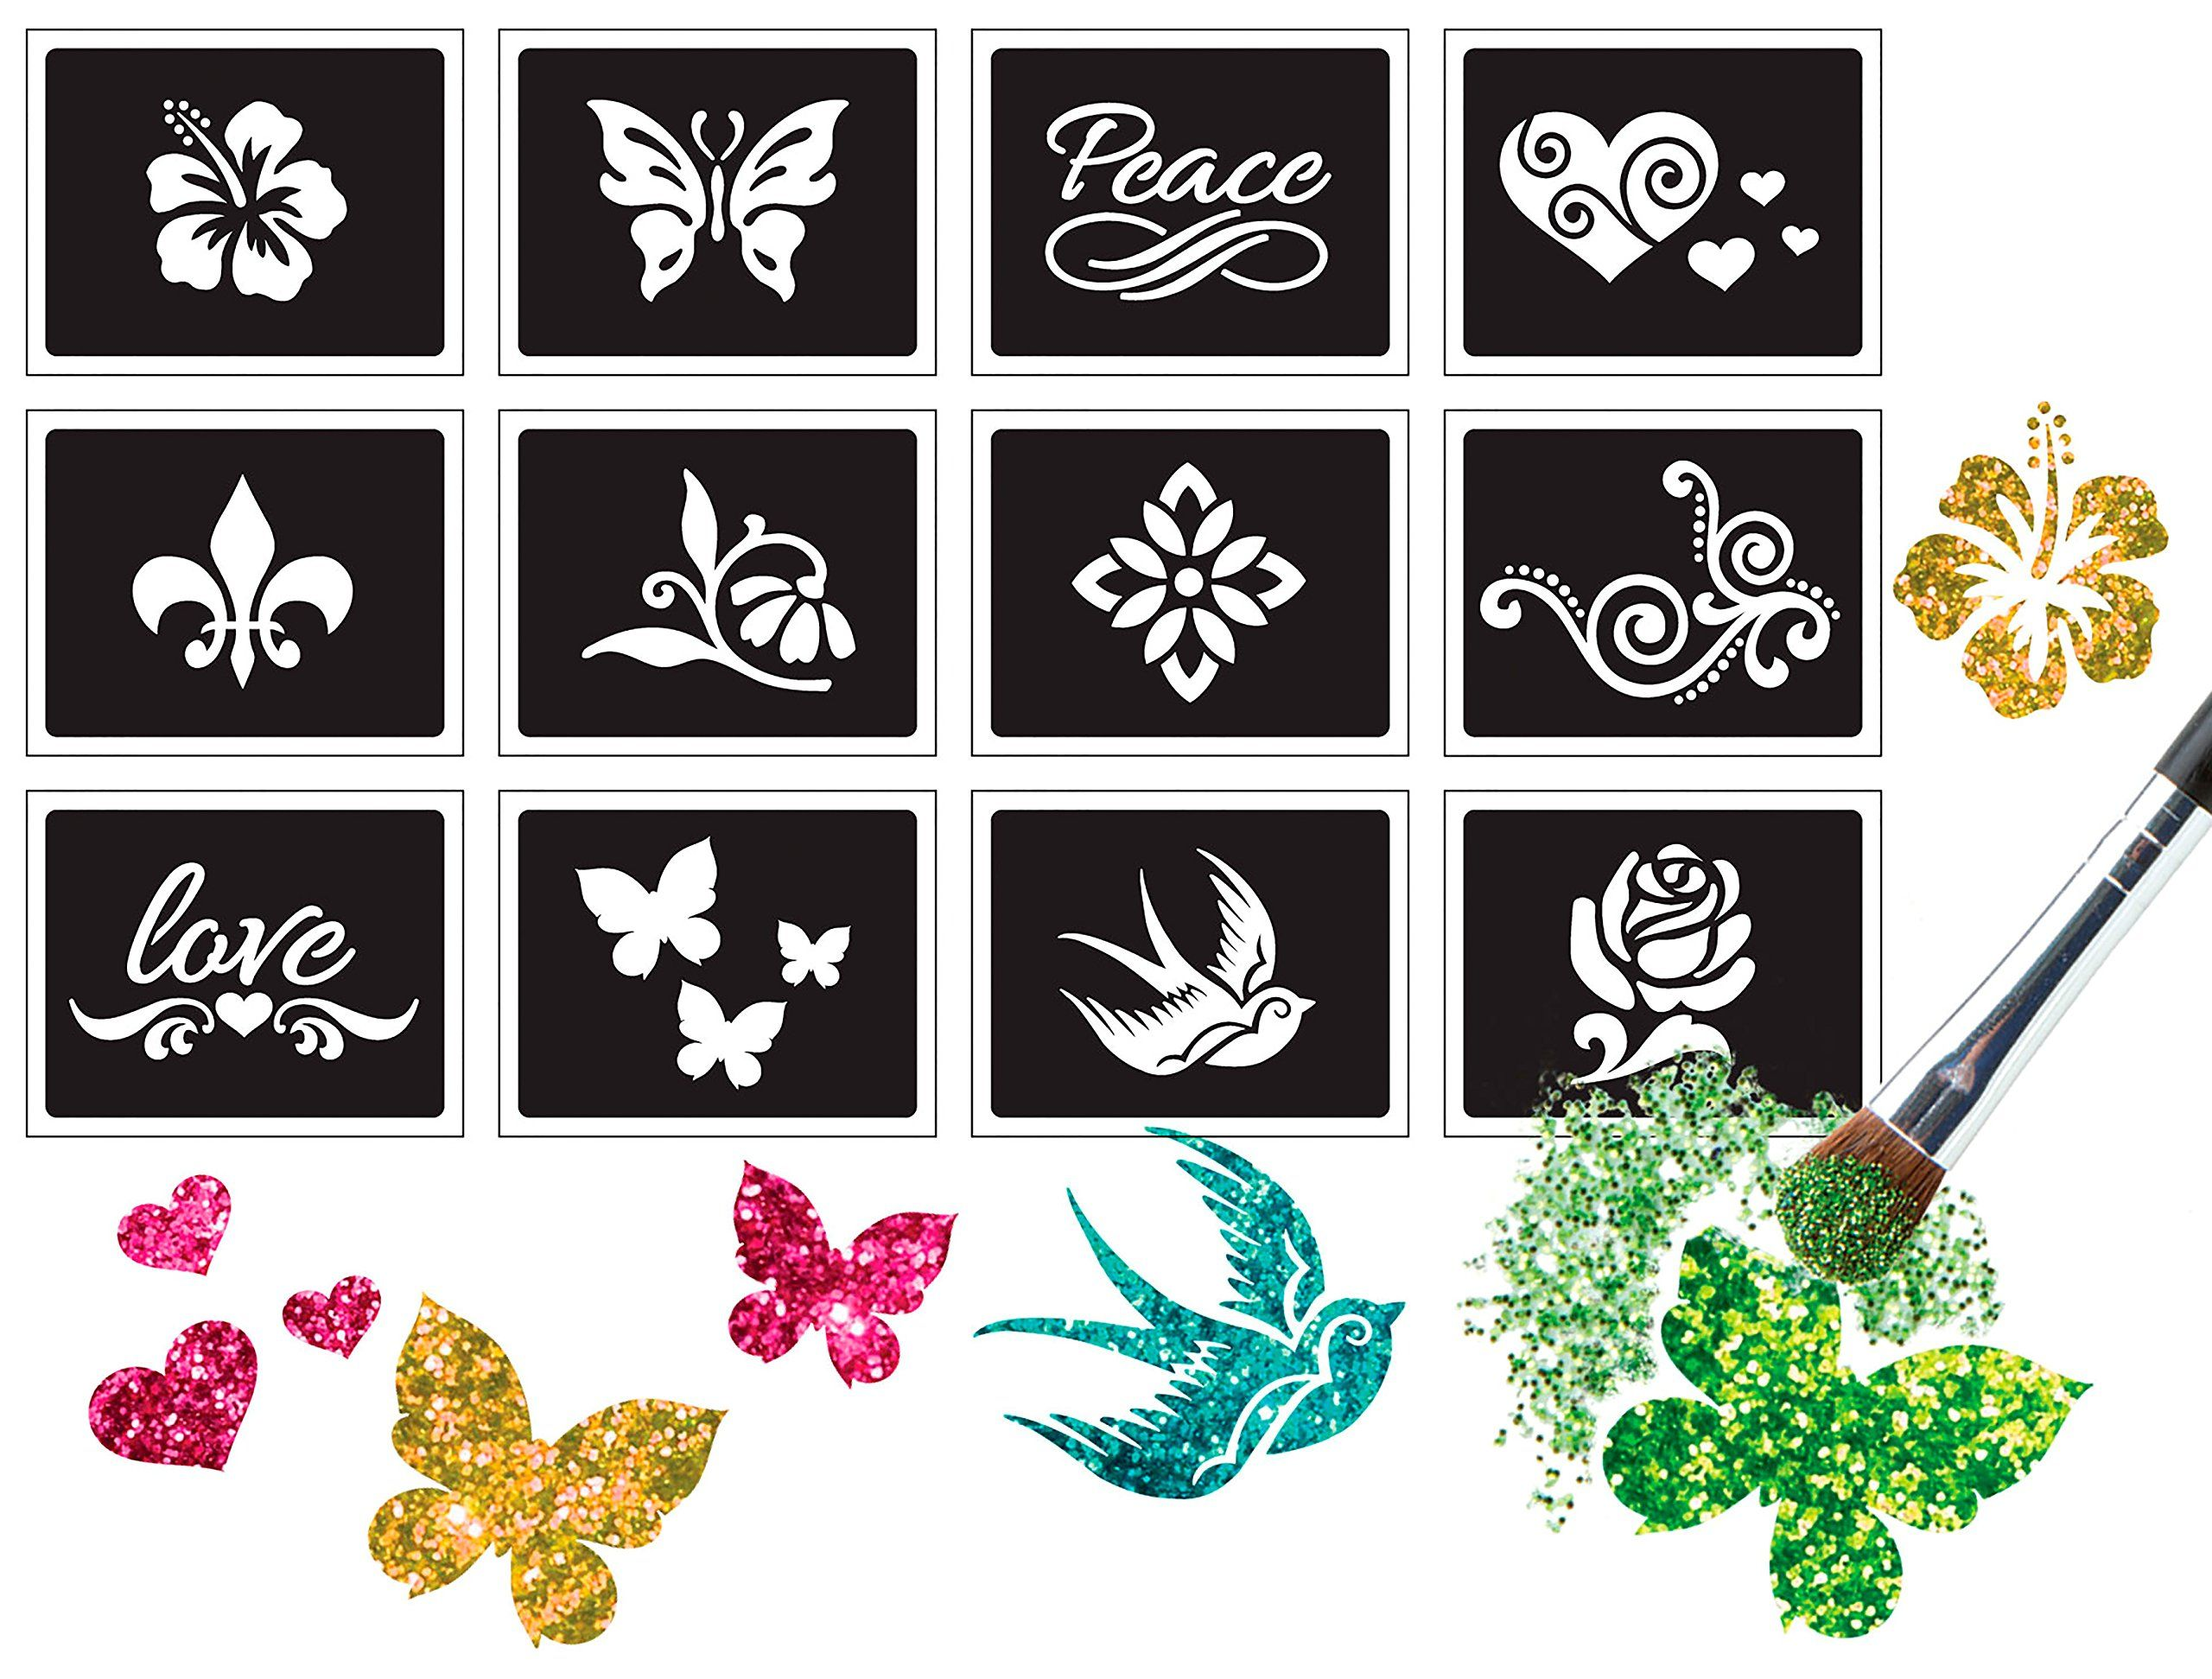 ALEX Spa Fun Sparkle Tattoo Parlor Peace and Love * Want